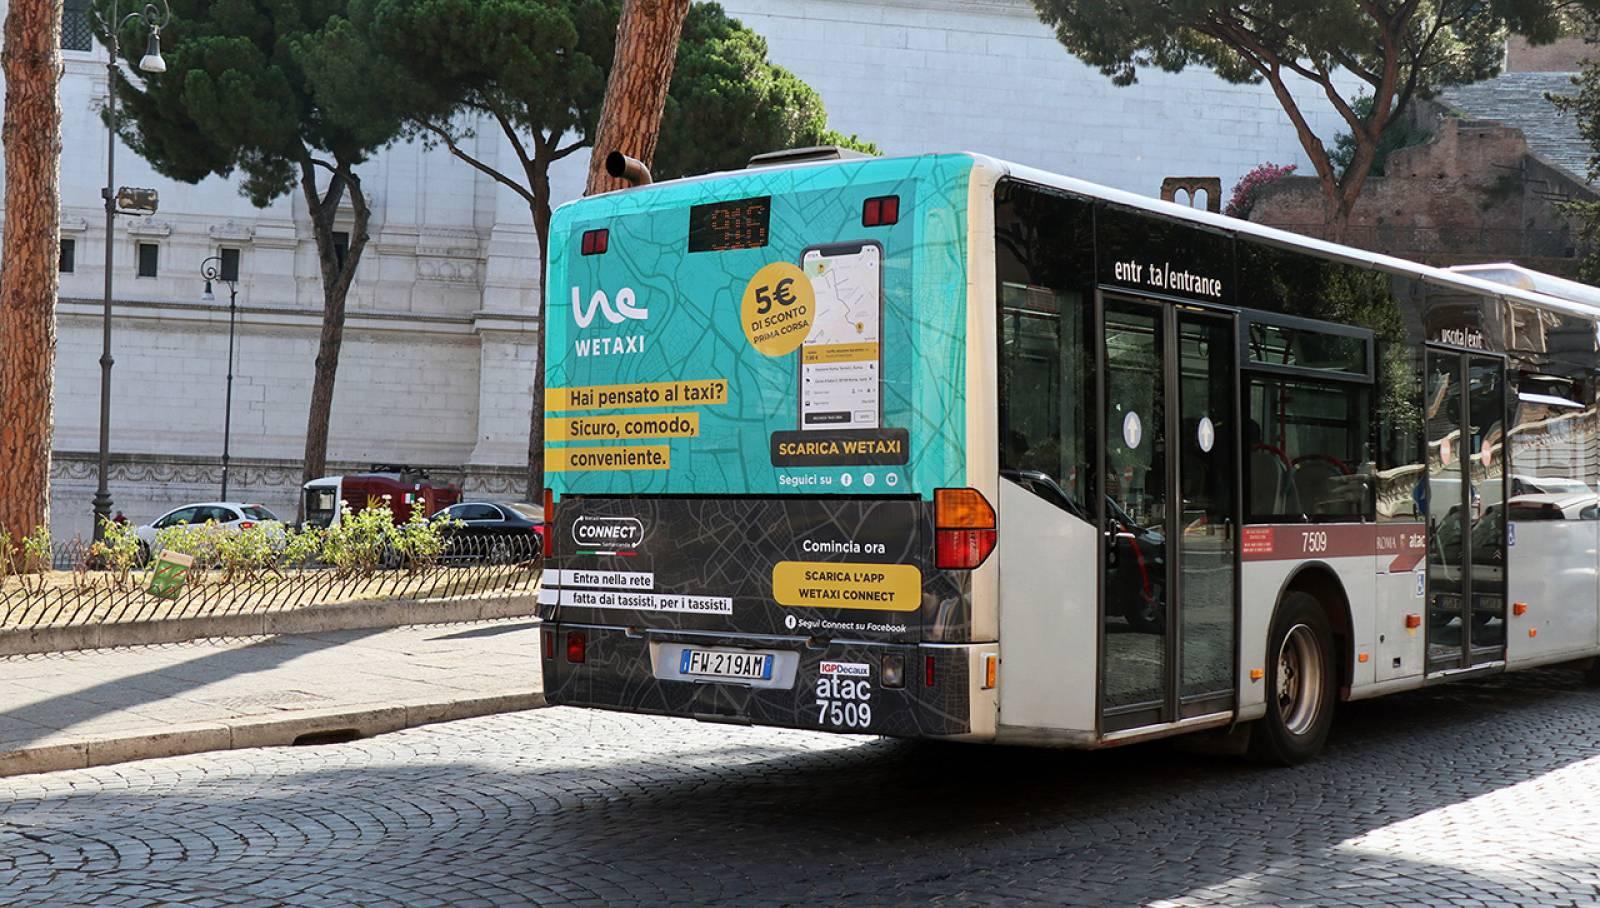 Pubblicità OOH su autobus IGPDecaux Fullback a Roma per WeTaxi